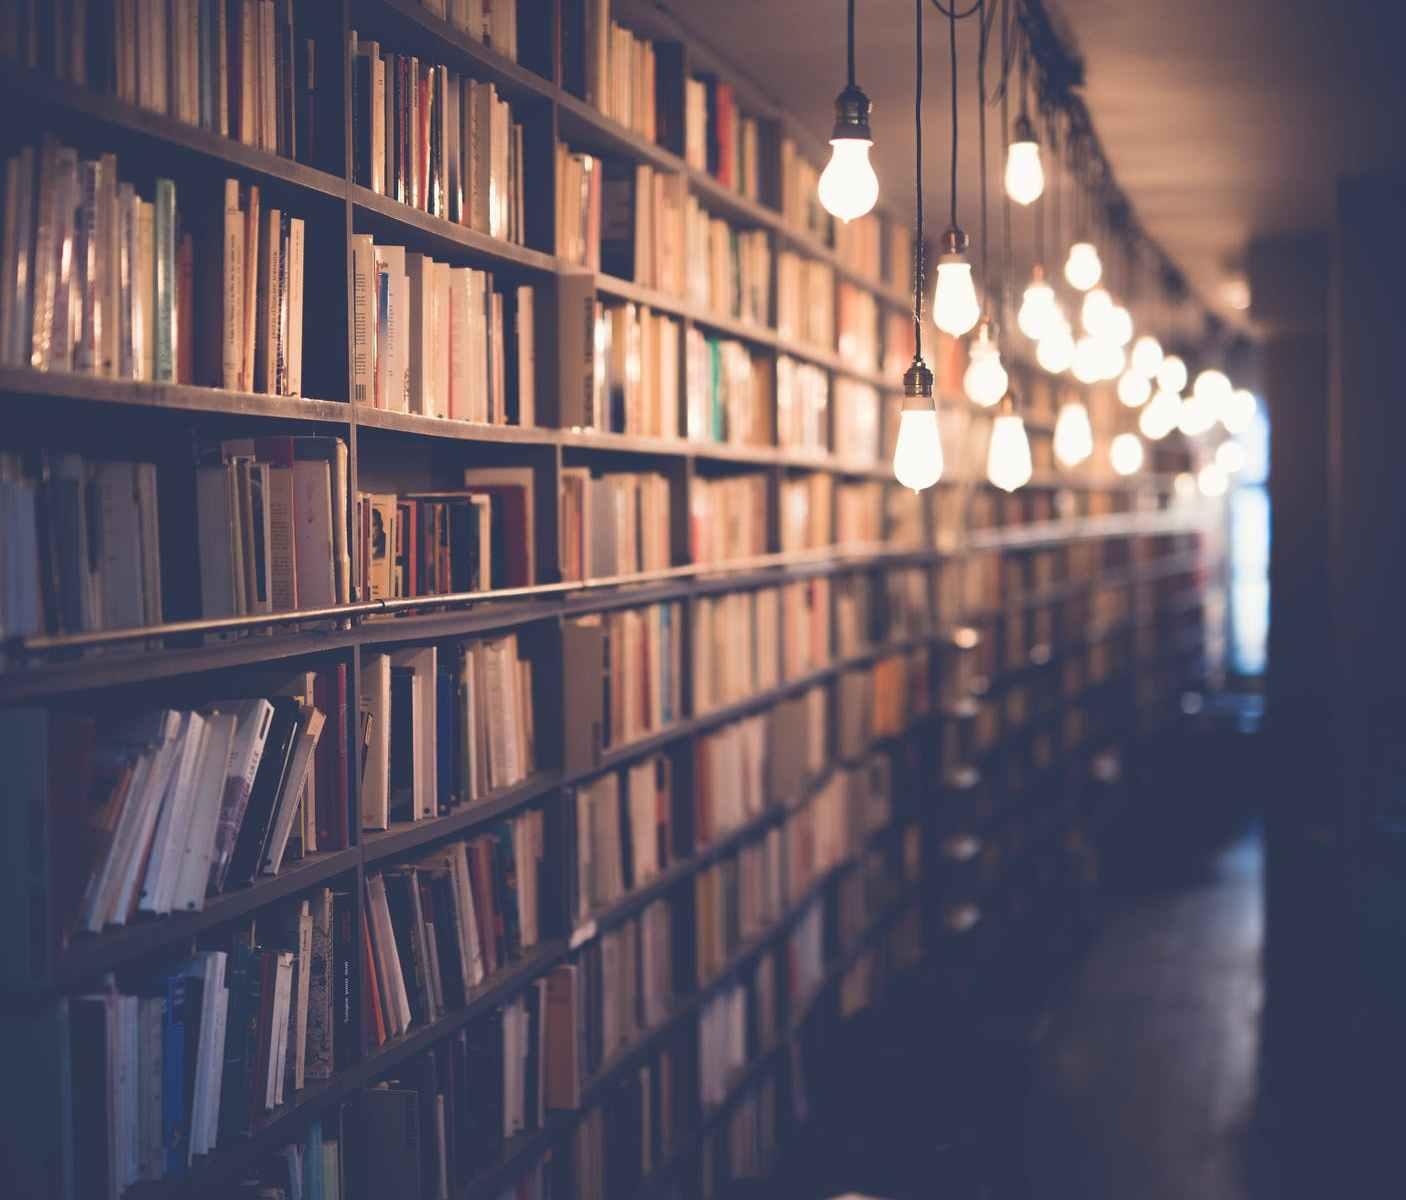 libri-scaffali-lampadina-books